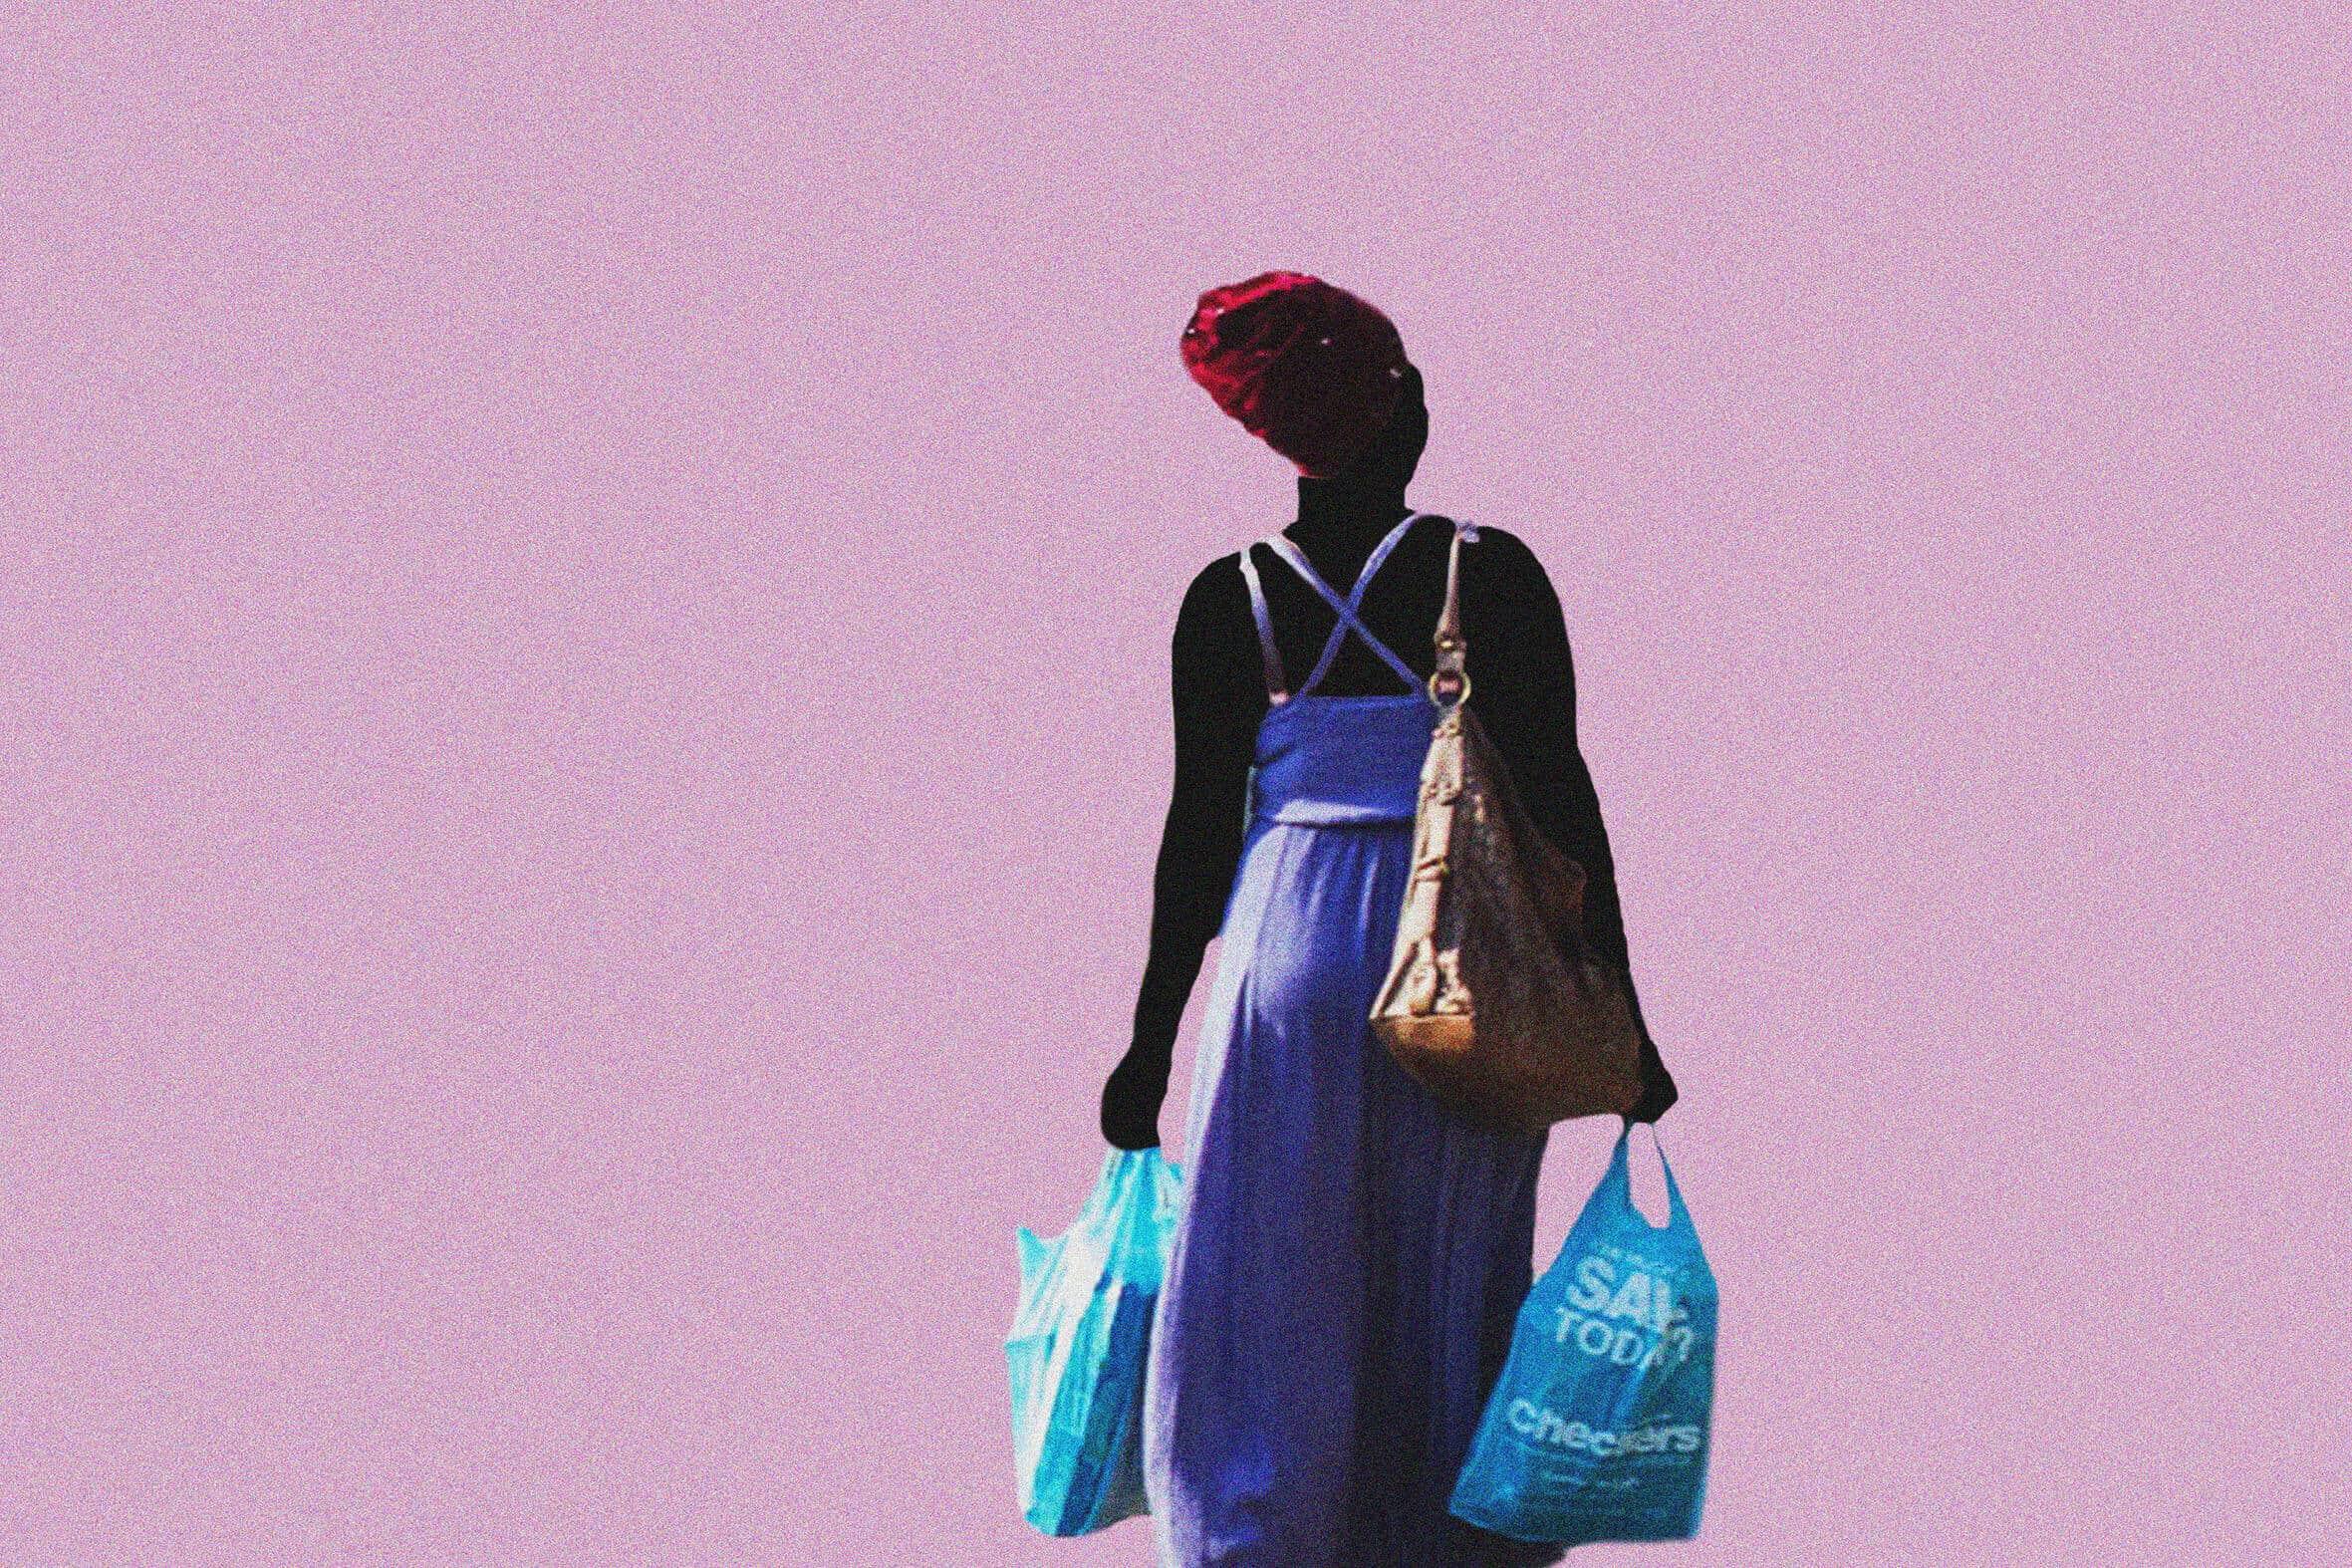 Lusanda Ndita aus der Serie Iqhawe, 2019. Digitale Collage, 60 x 40 cm.